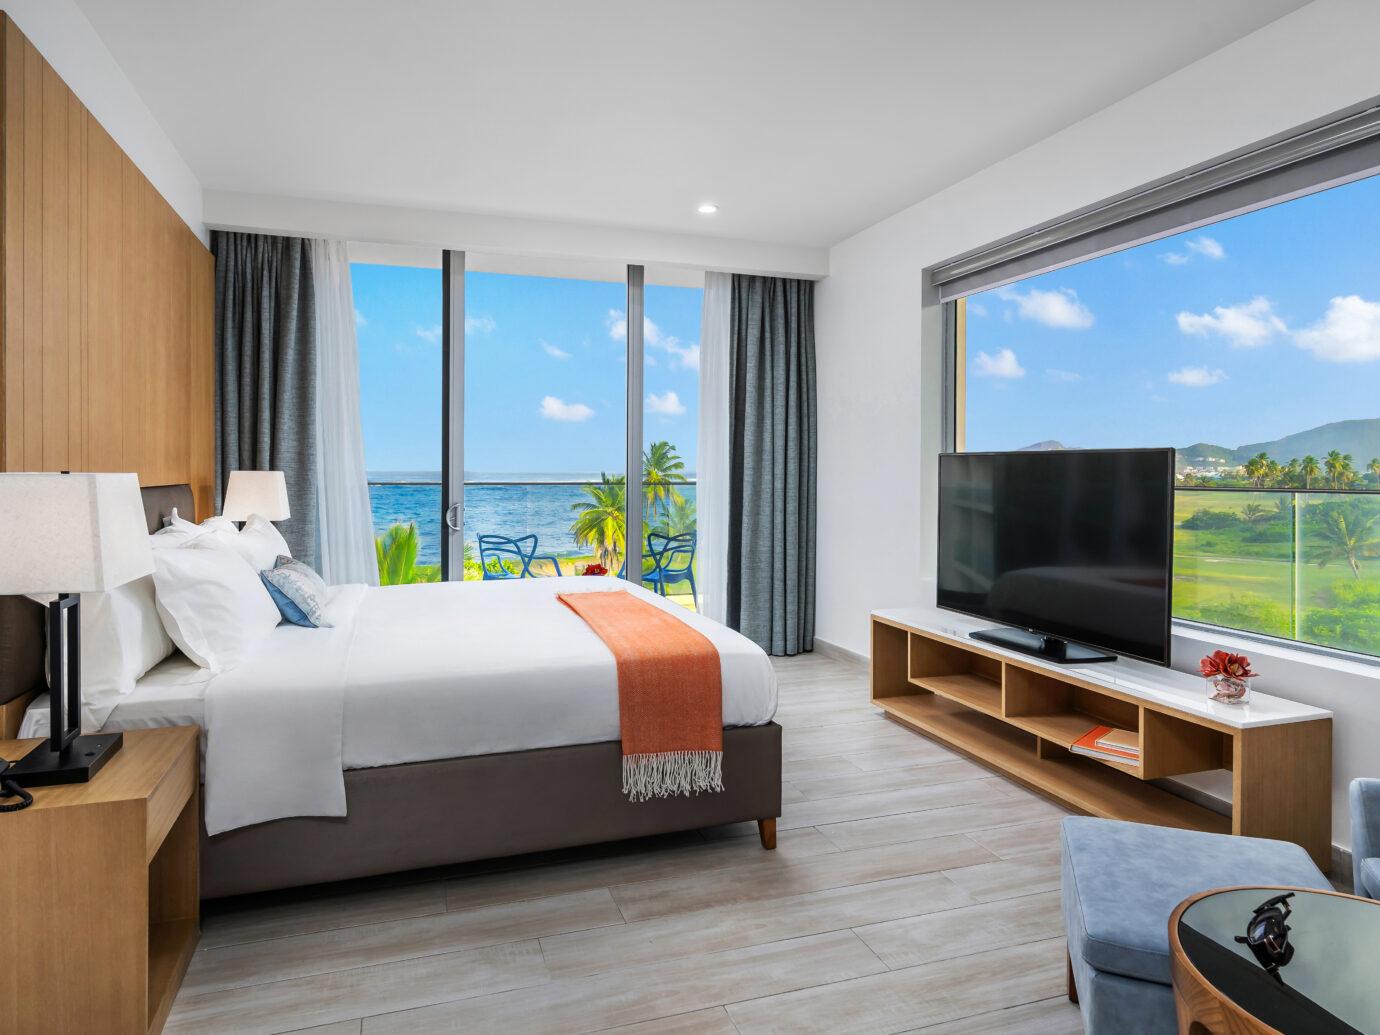 Bedroom at Koi Resort